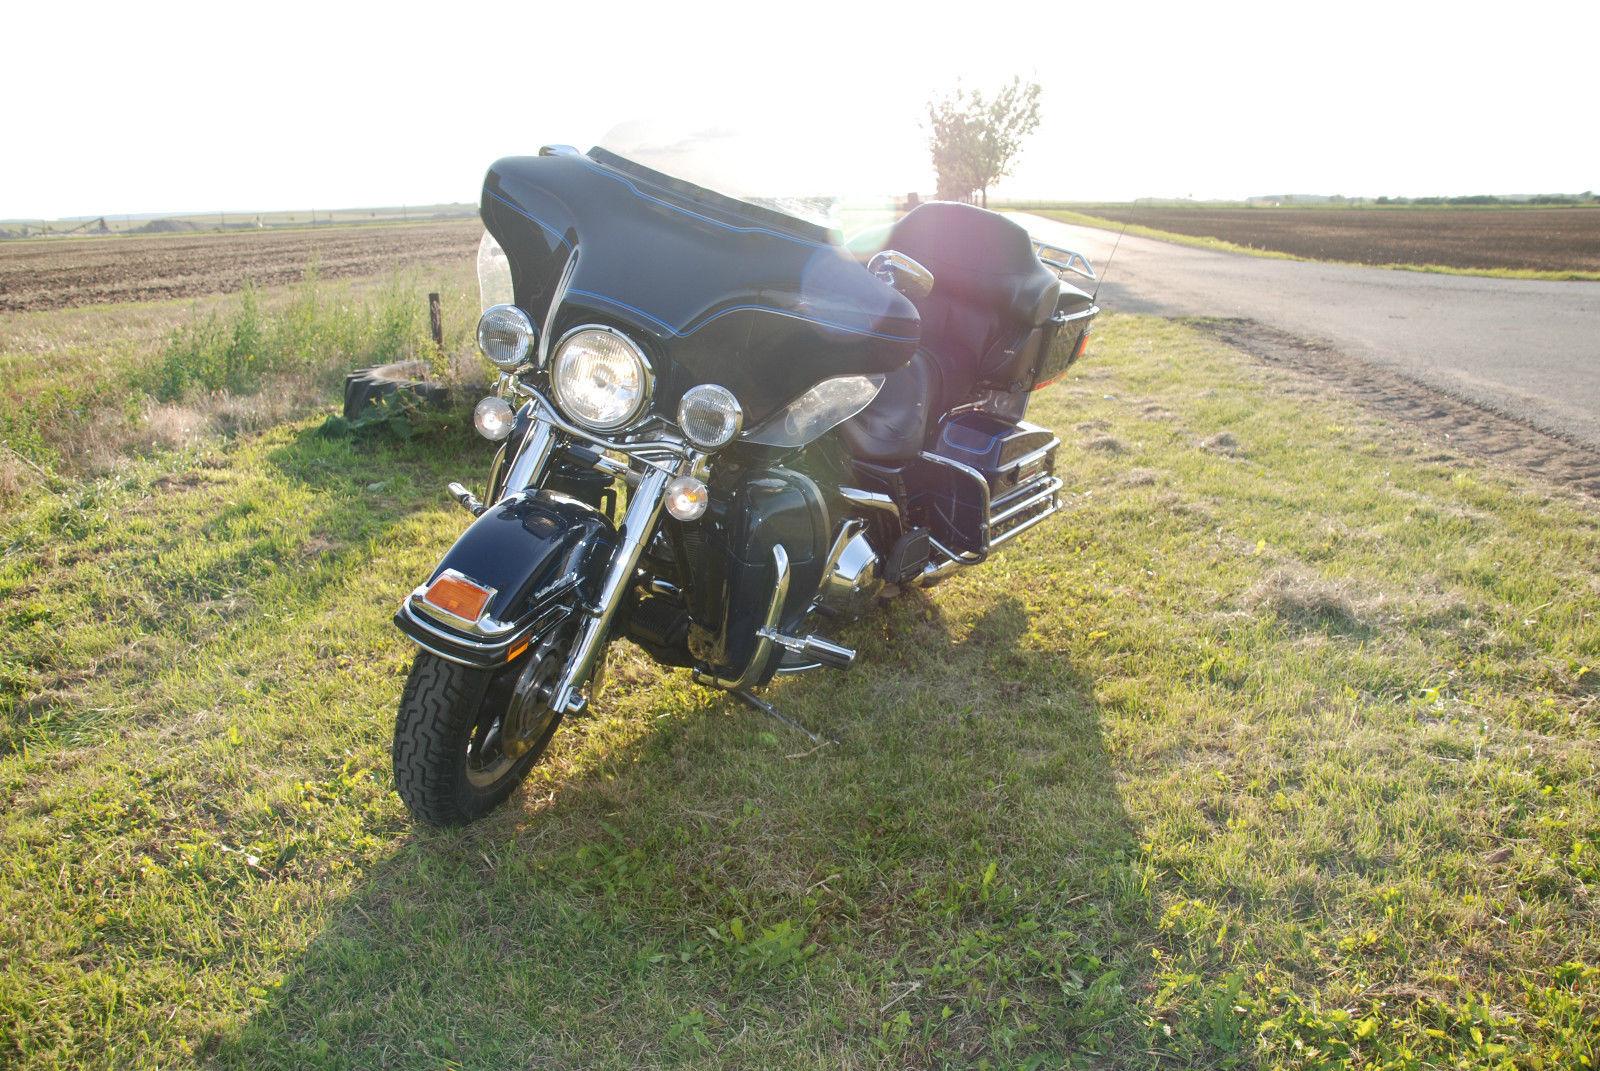 Motorrad: Harley Davidson FLHTCUSE Ultra Classic Electra Glide um ...